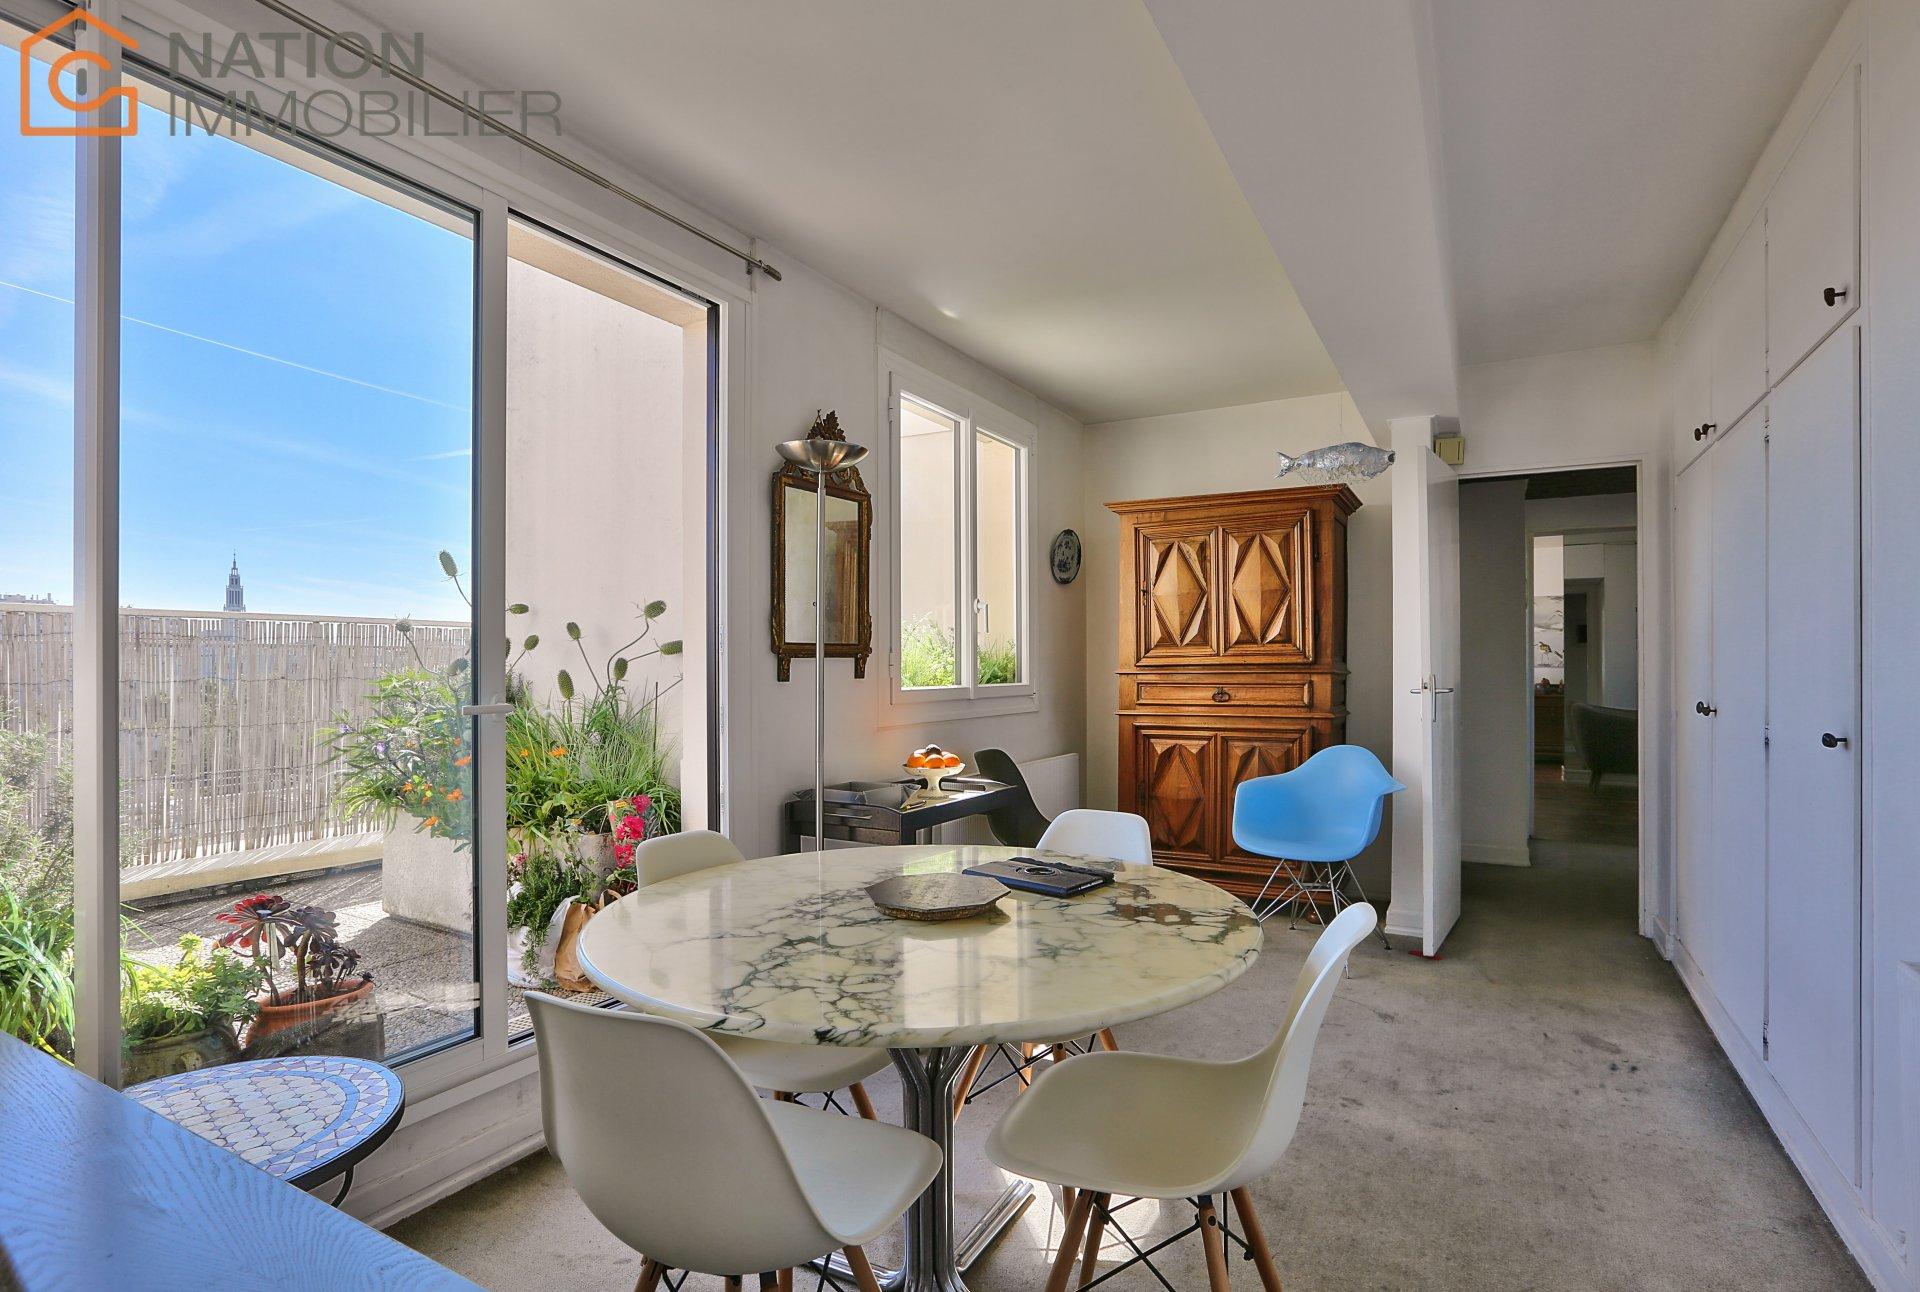 Vendita Appartamento - Paris 11ème Sainte-Marguerite